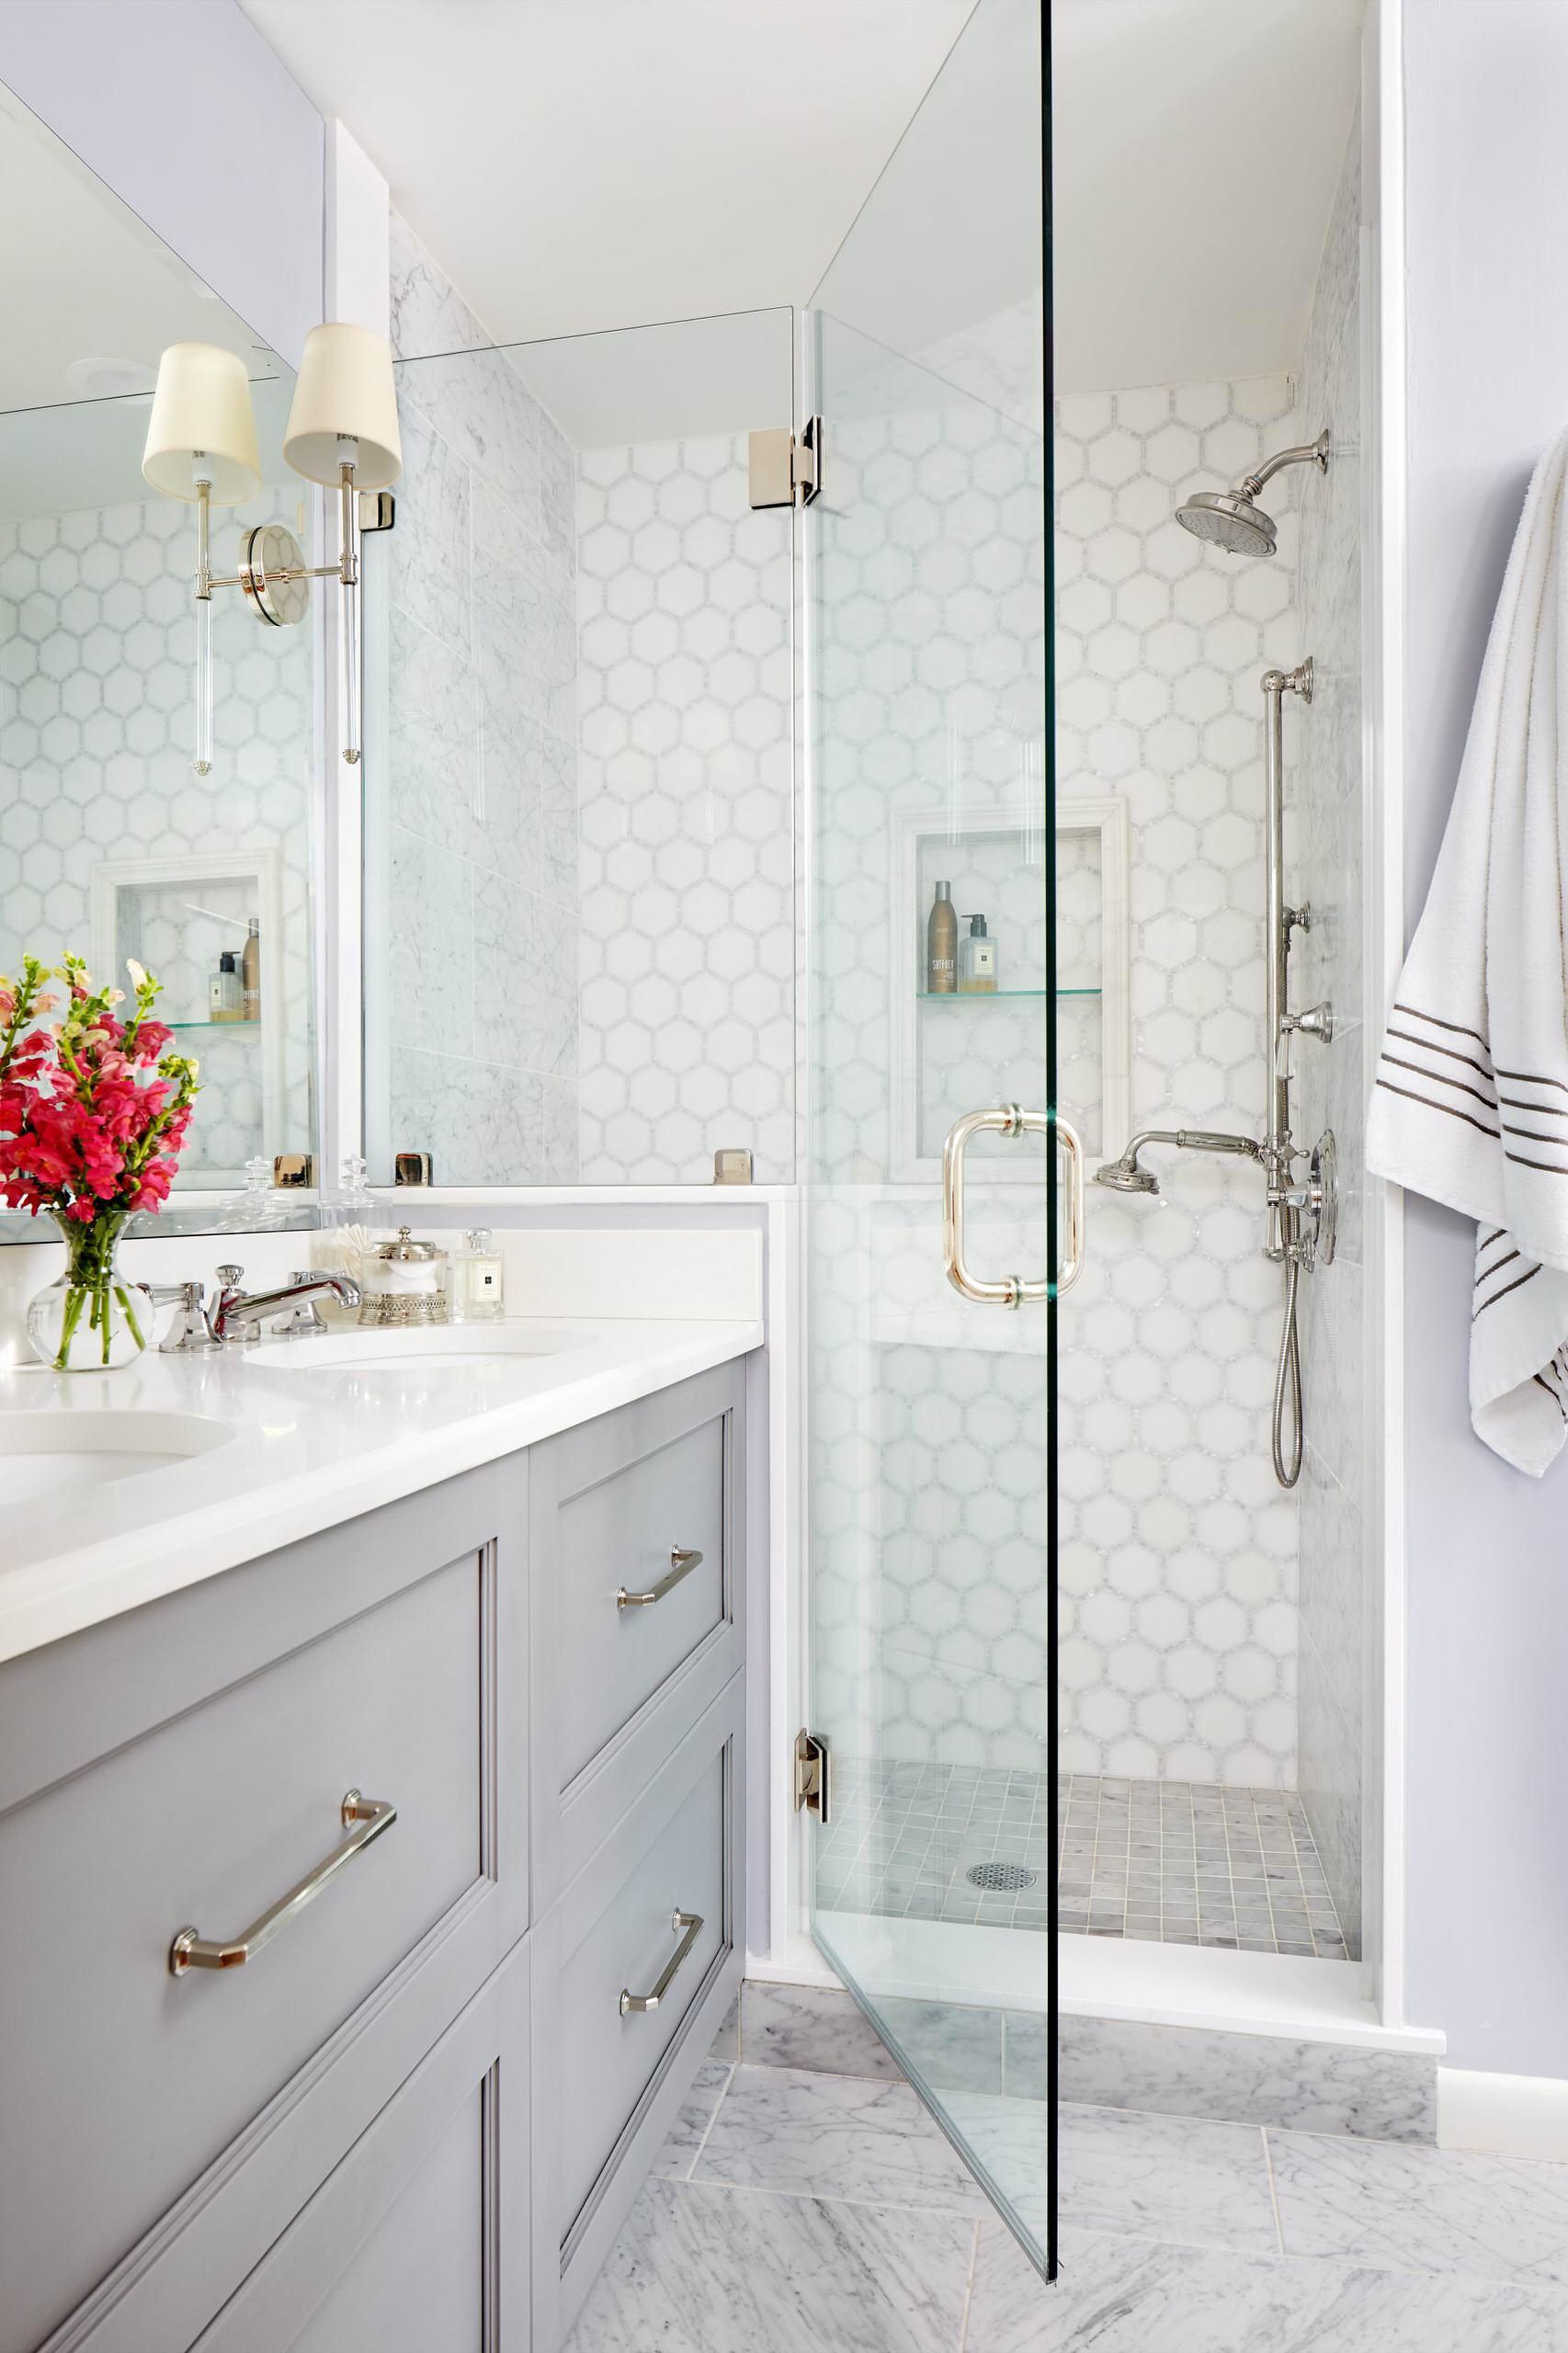 75 Beautiful Mosaic Tile Bathroom Pictures Ideas November 2020 Houzz